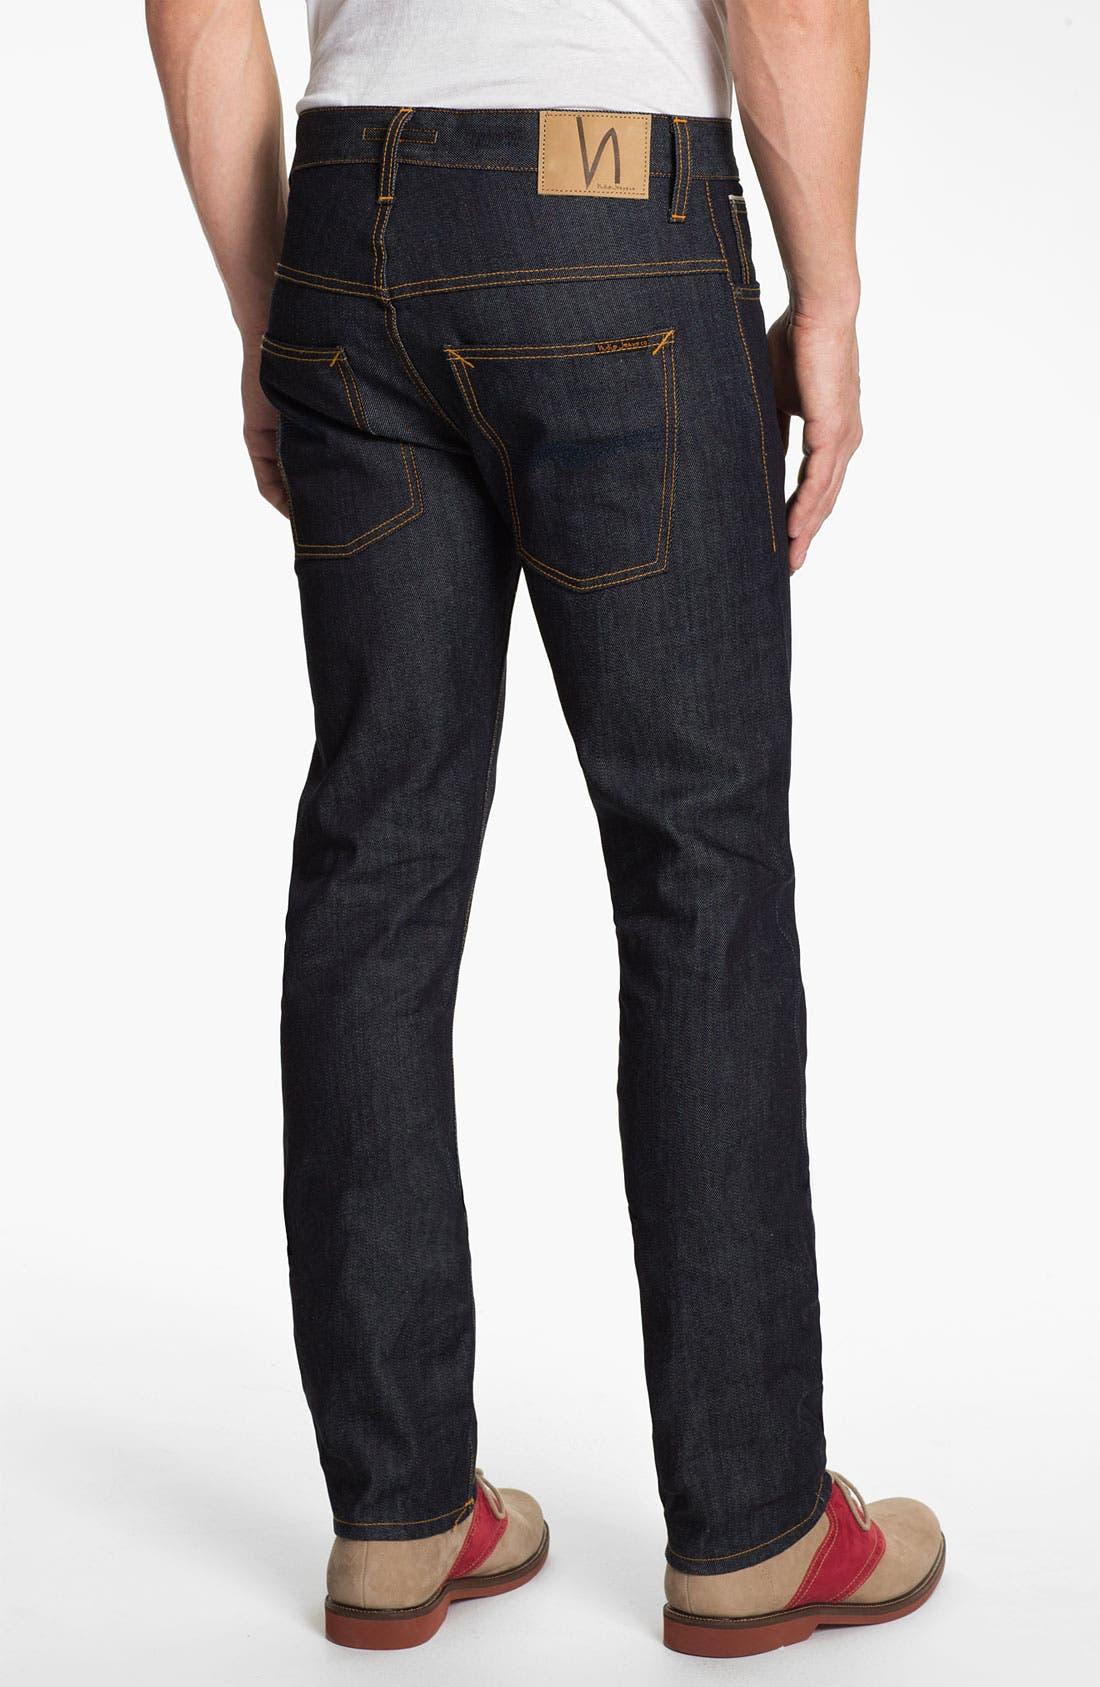 Main Image - Nudie 'Thin Finn' Slim Skinny Leg Jeans (Organic Dry Heavy Selvedge)